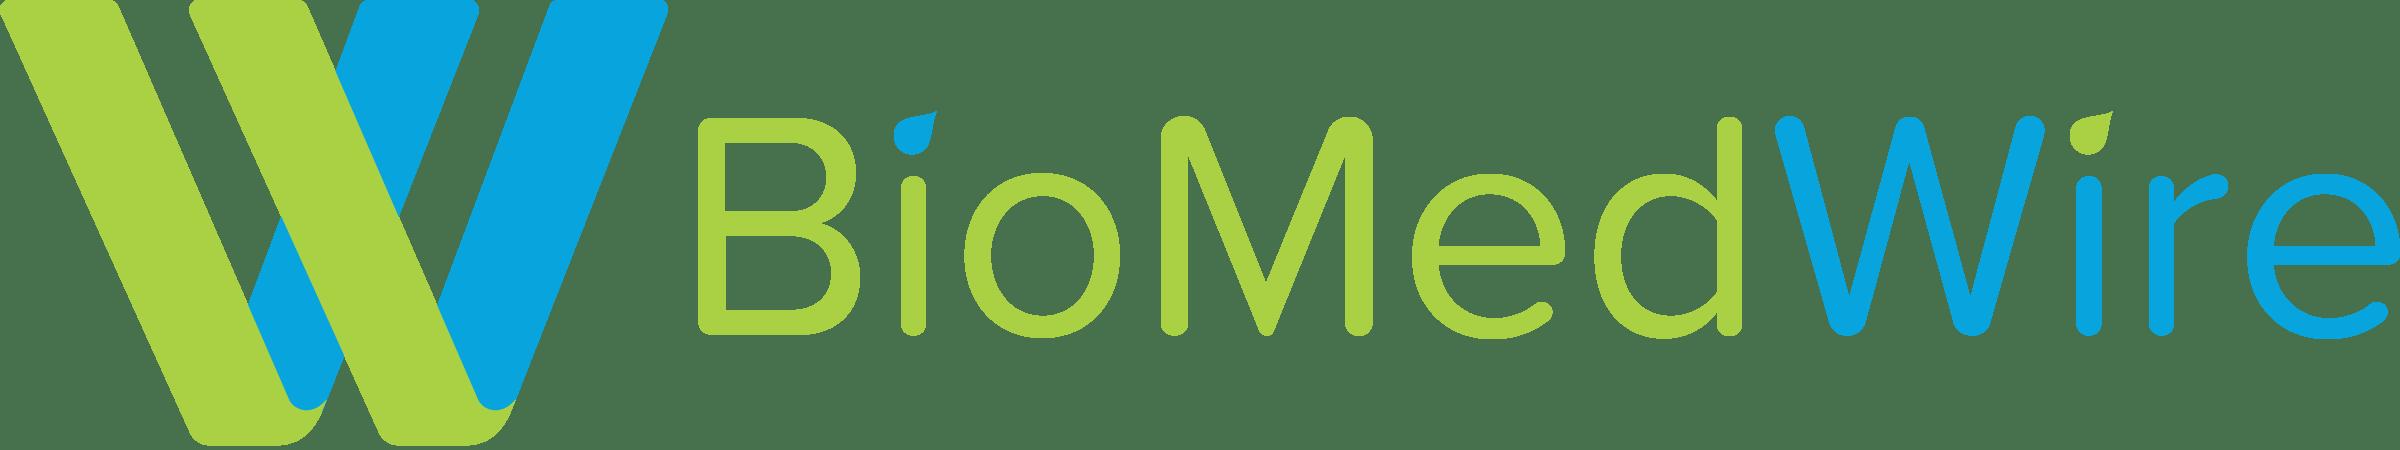 BioMedWire Logo